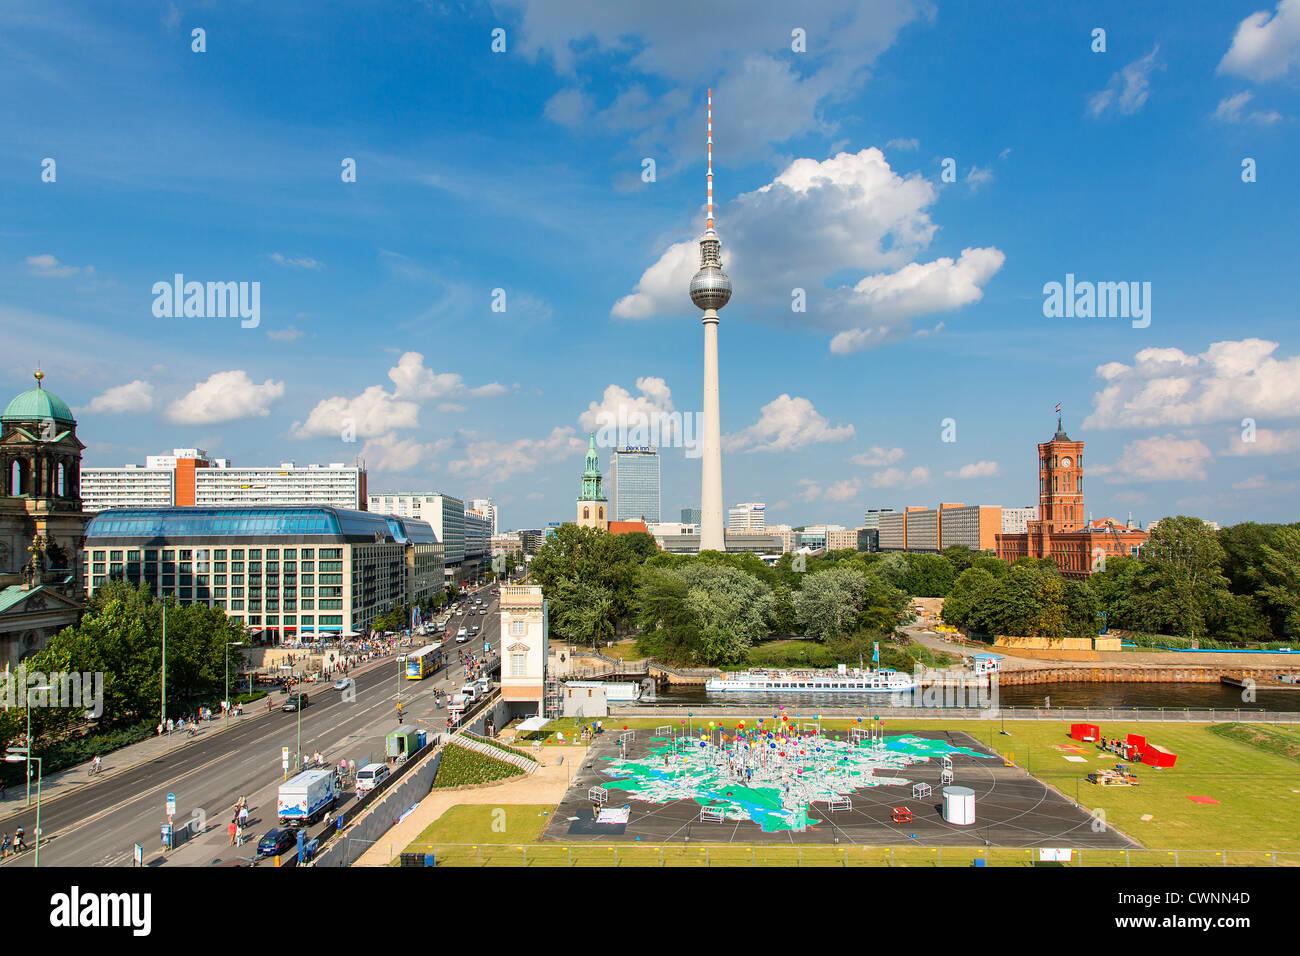 Europa, Deutschland, Fernsehturm, Fernsehturm, Berlin. Stockfoto